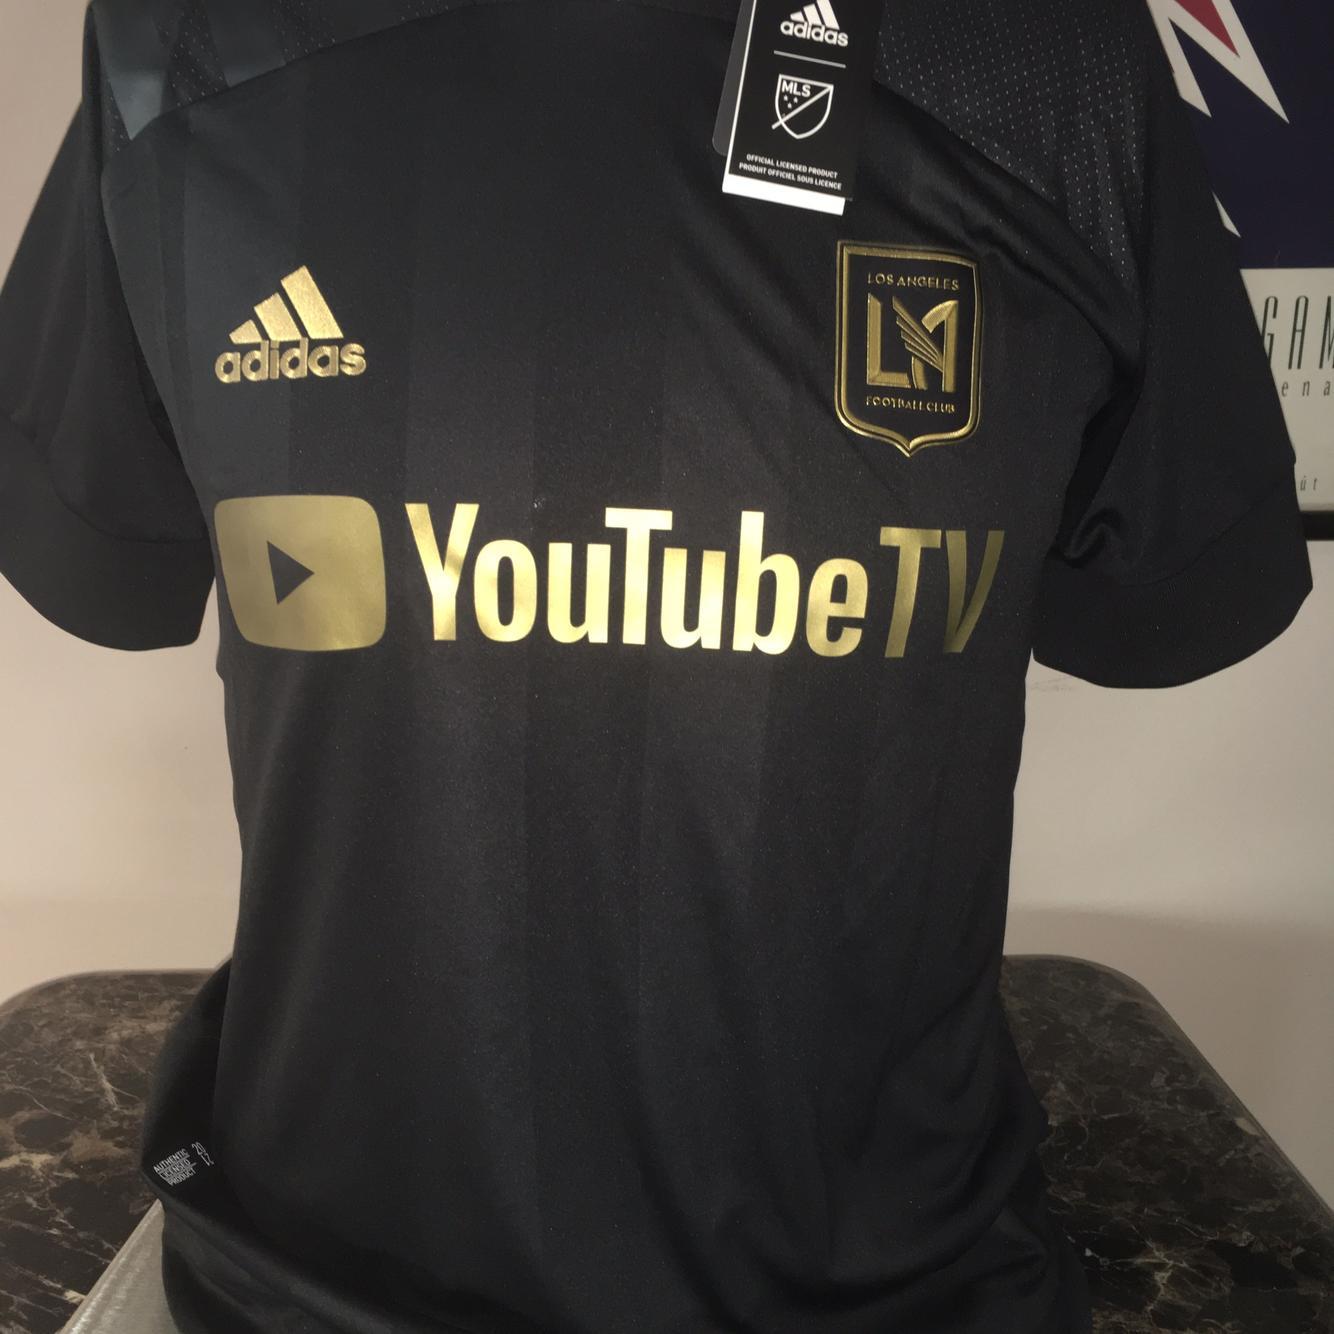 adidas Men's LAFC 2020-21 Home Jersey Black/Gold FL9602 Medium NWT ...